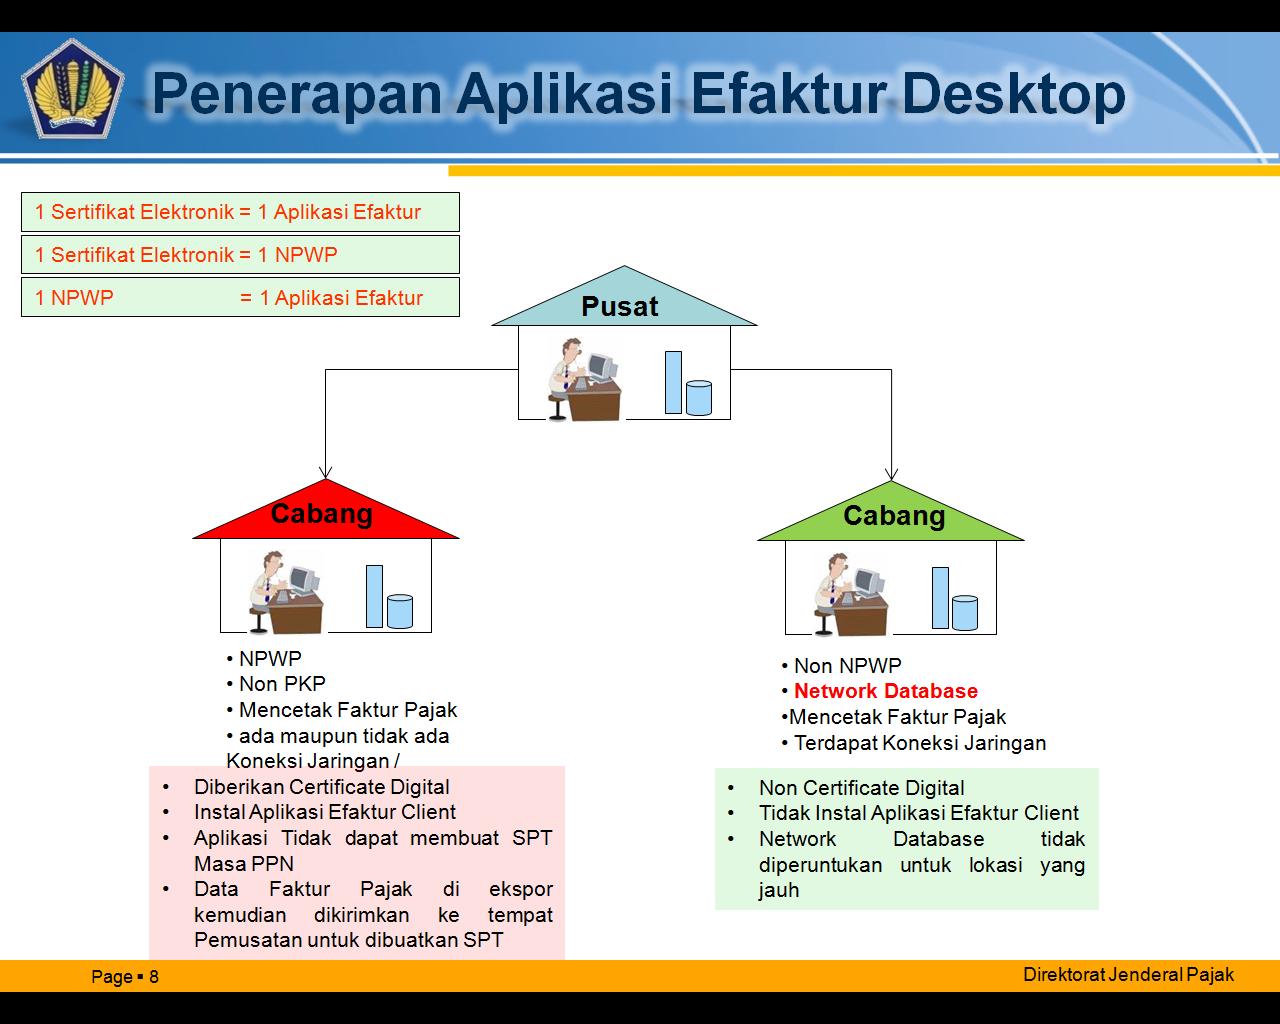 Penerapan aplikasi e-faktur desktop